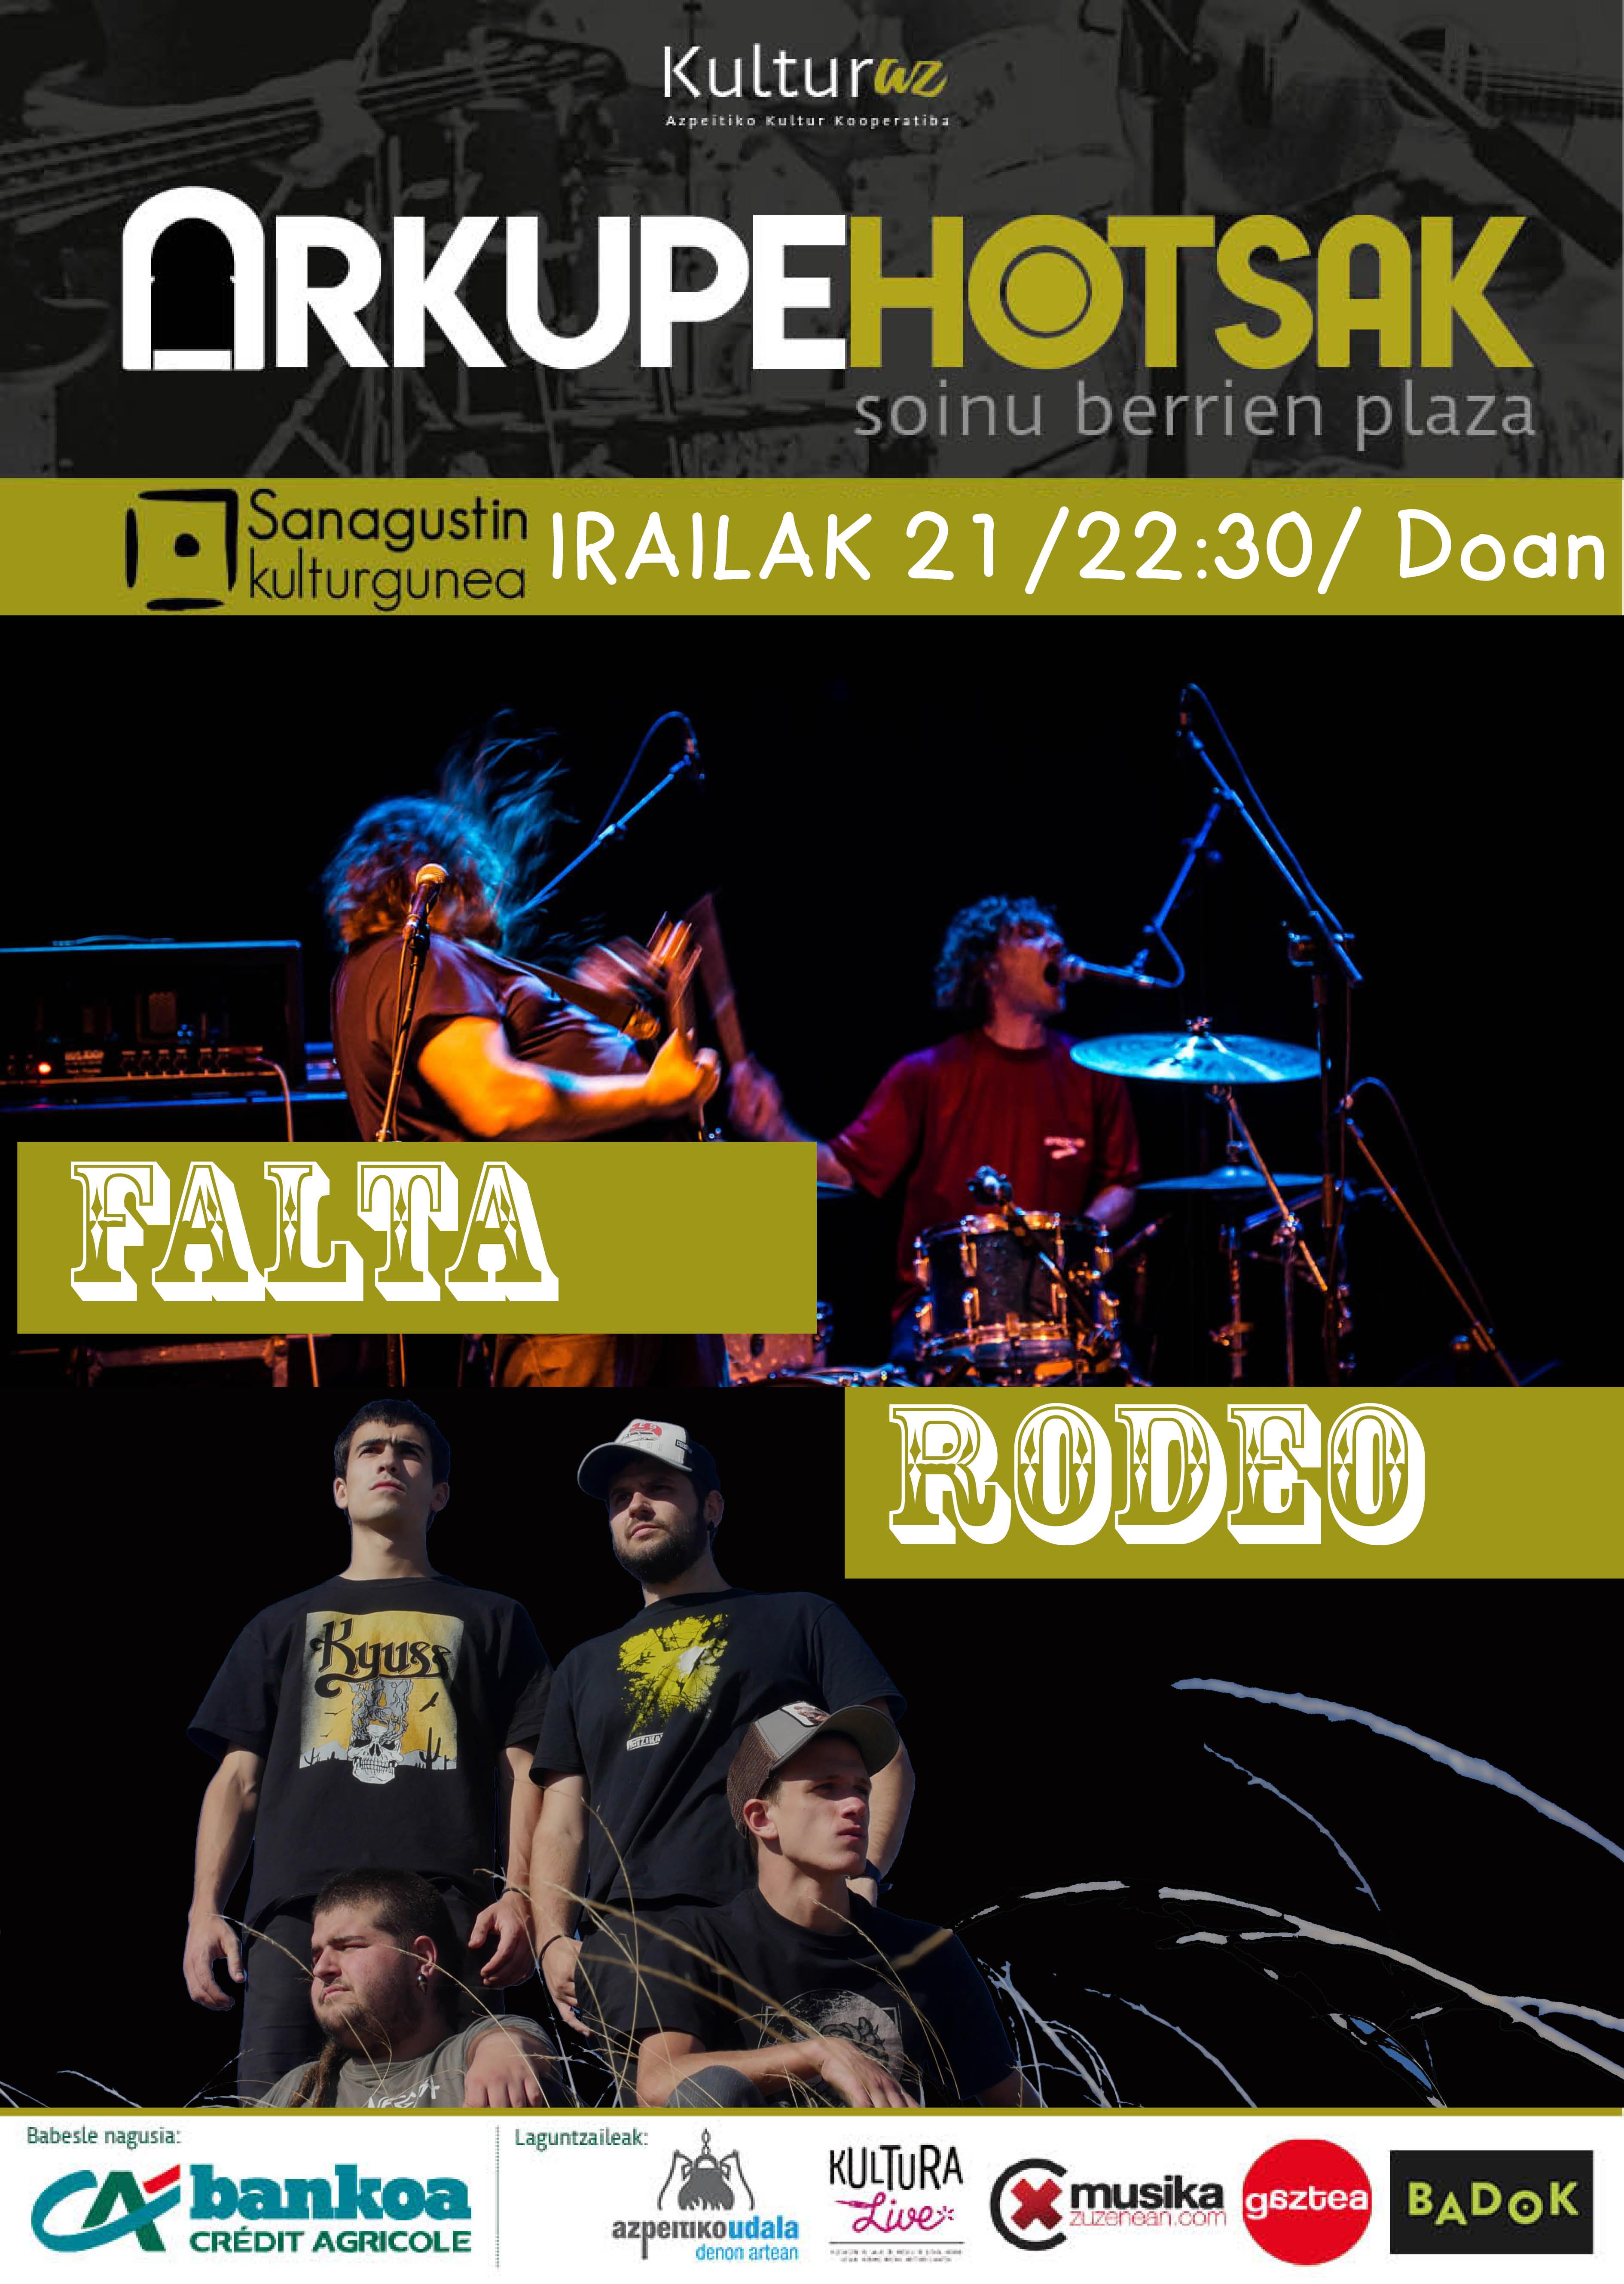 FaltA+Rodeo